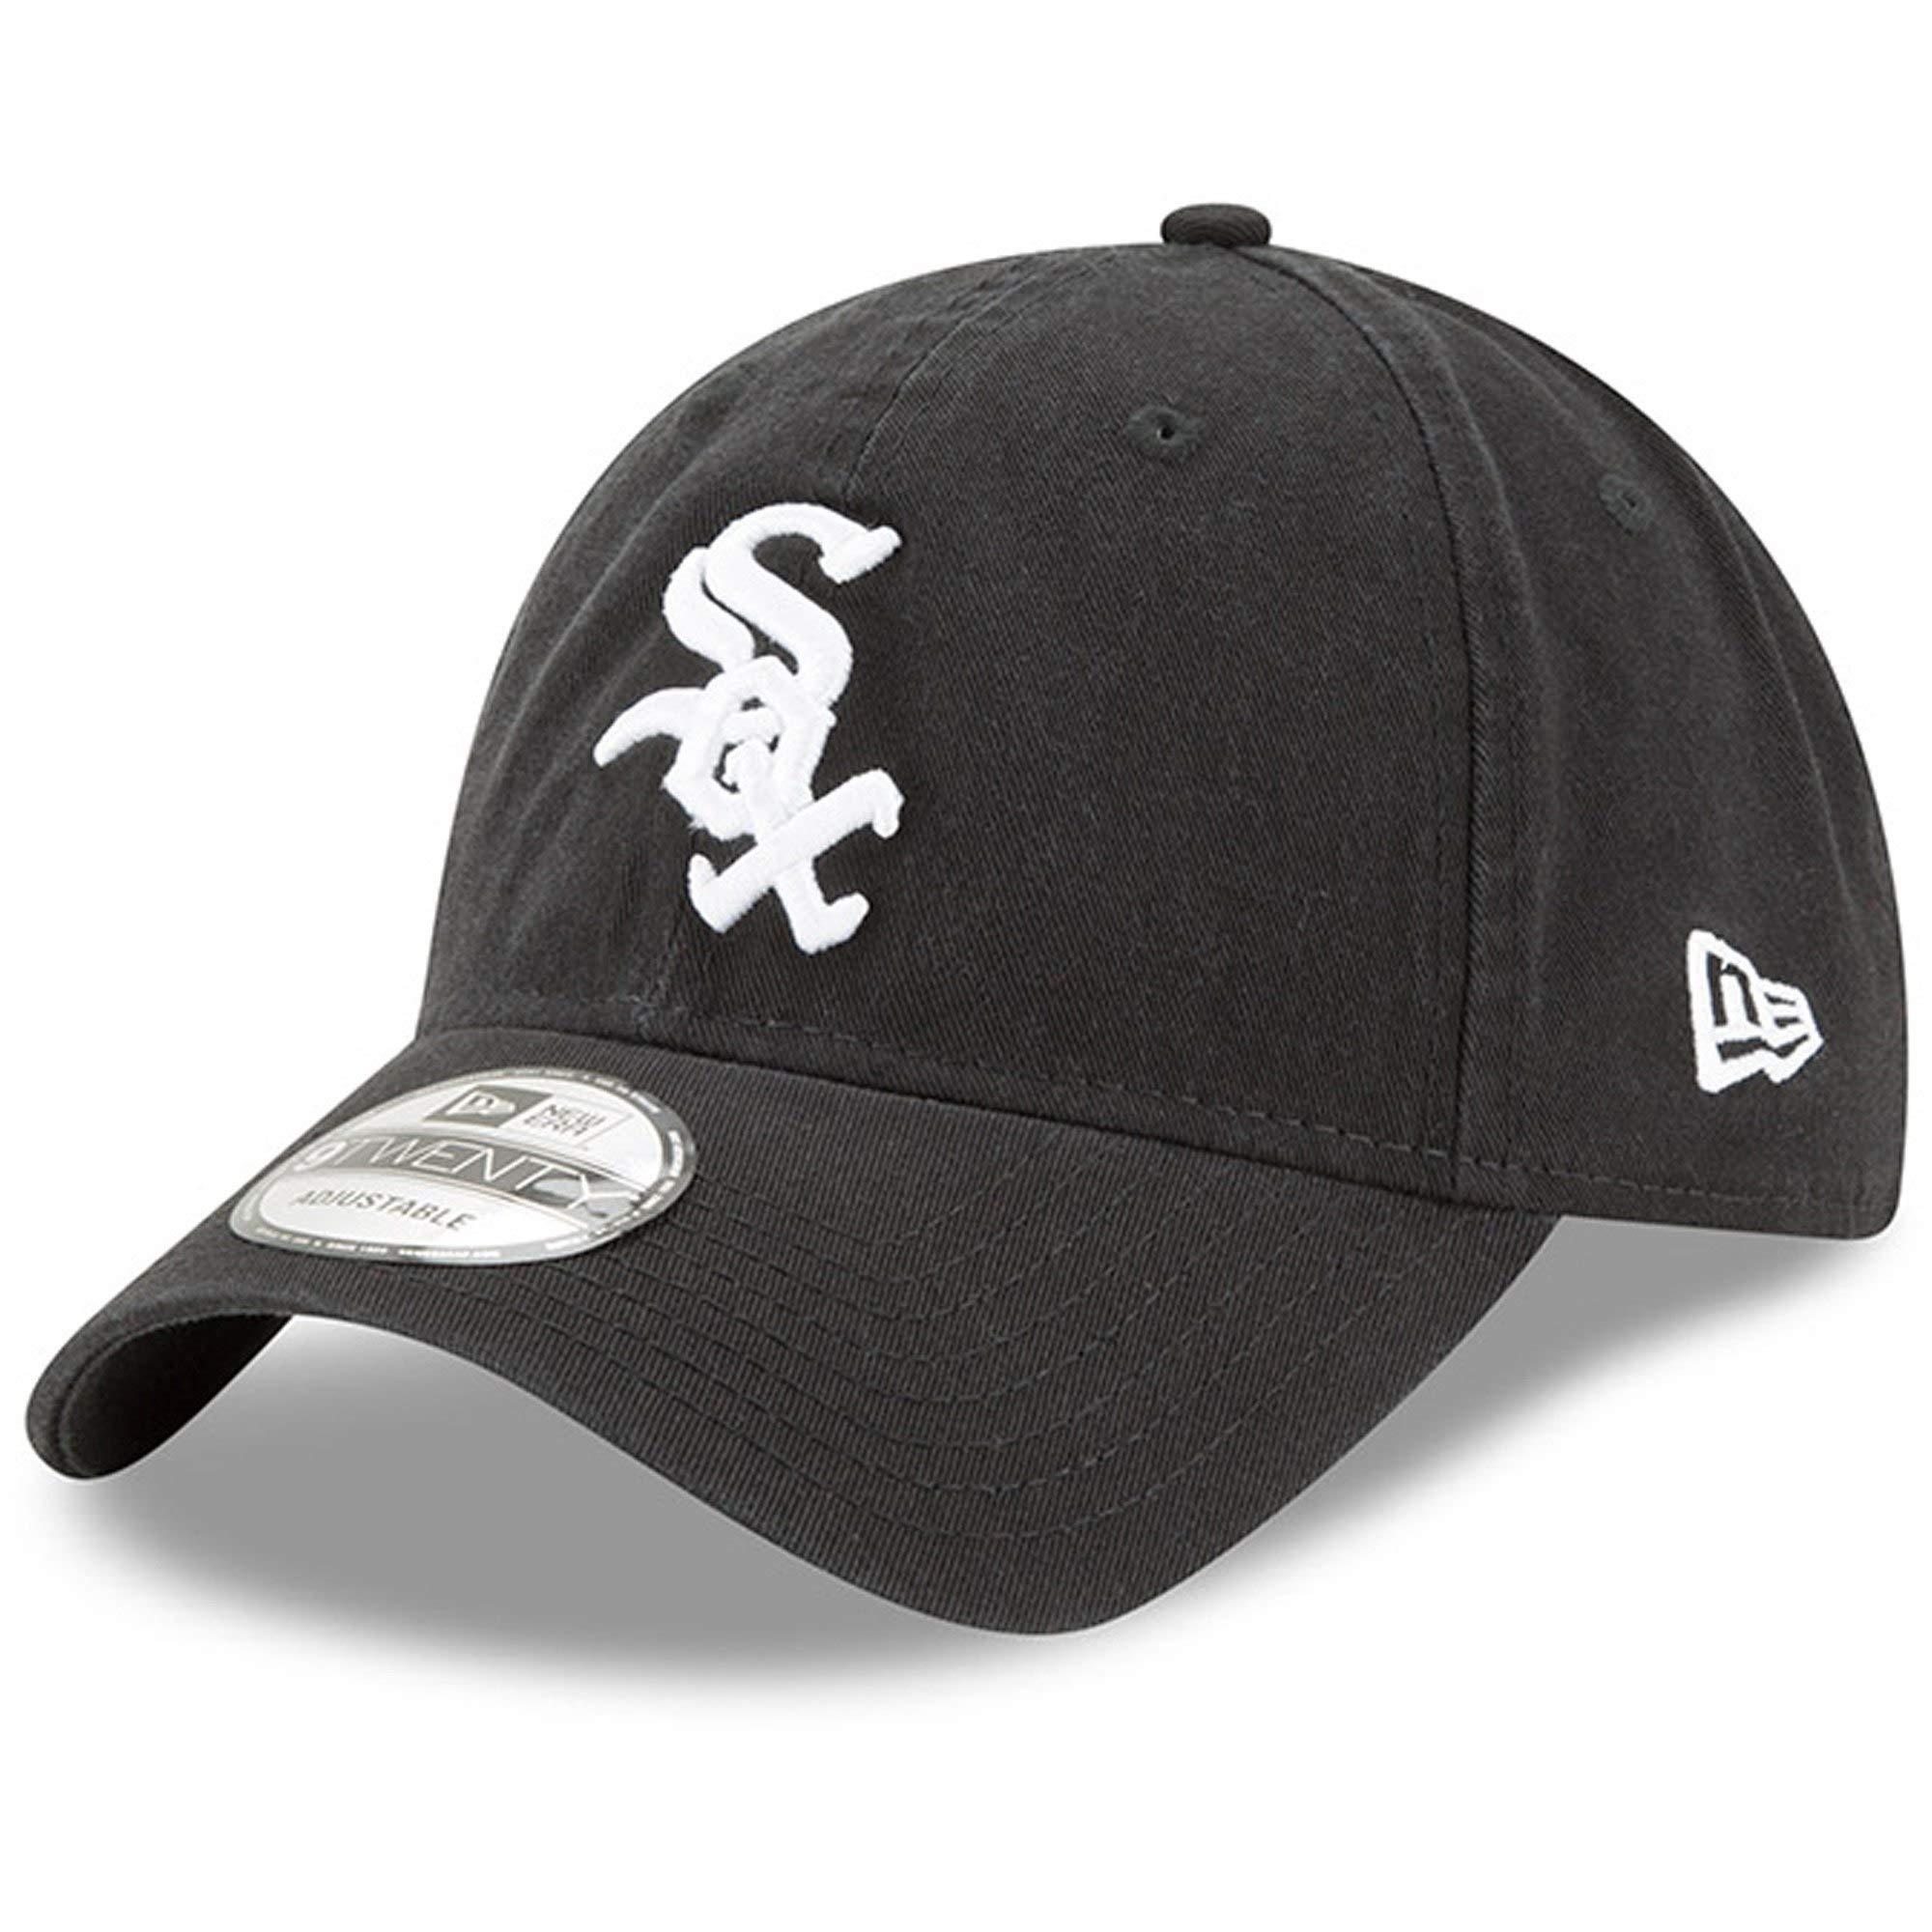 New Era Chicago White Sox Game Replica Core Classic 9TWENTY Adjustable Hat